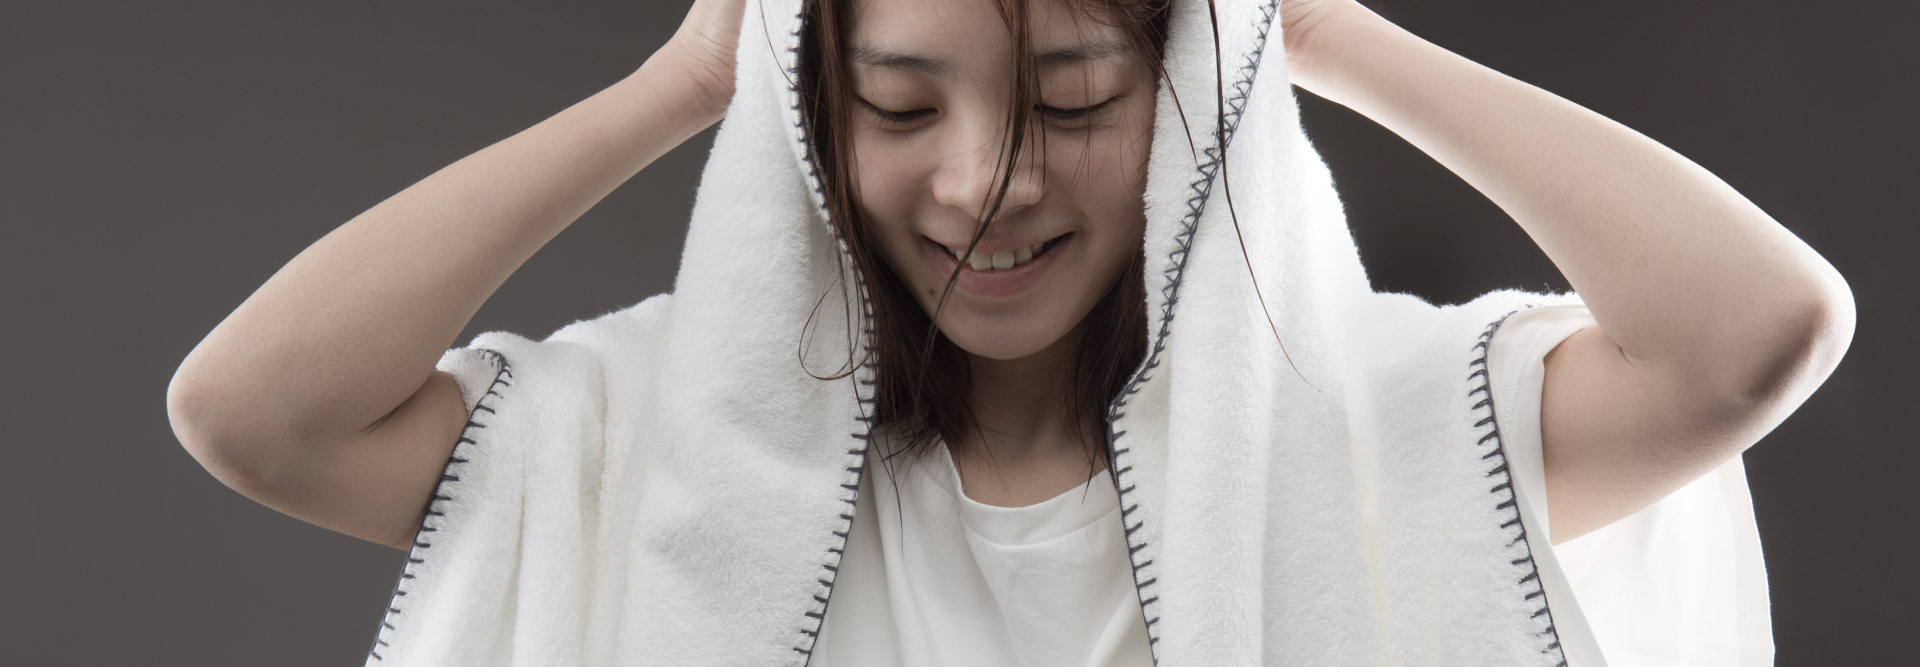 430g/㎡埃及长绒棉,懂得你们的肌肤之亲